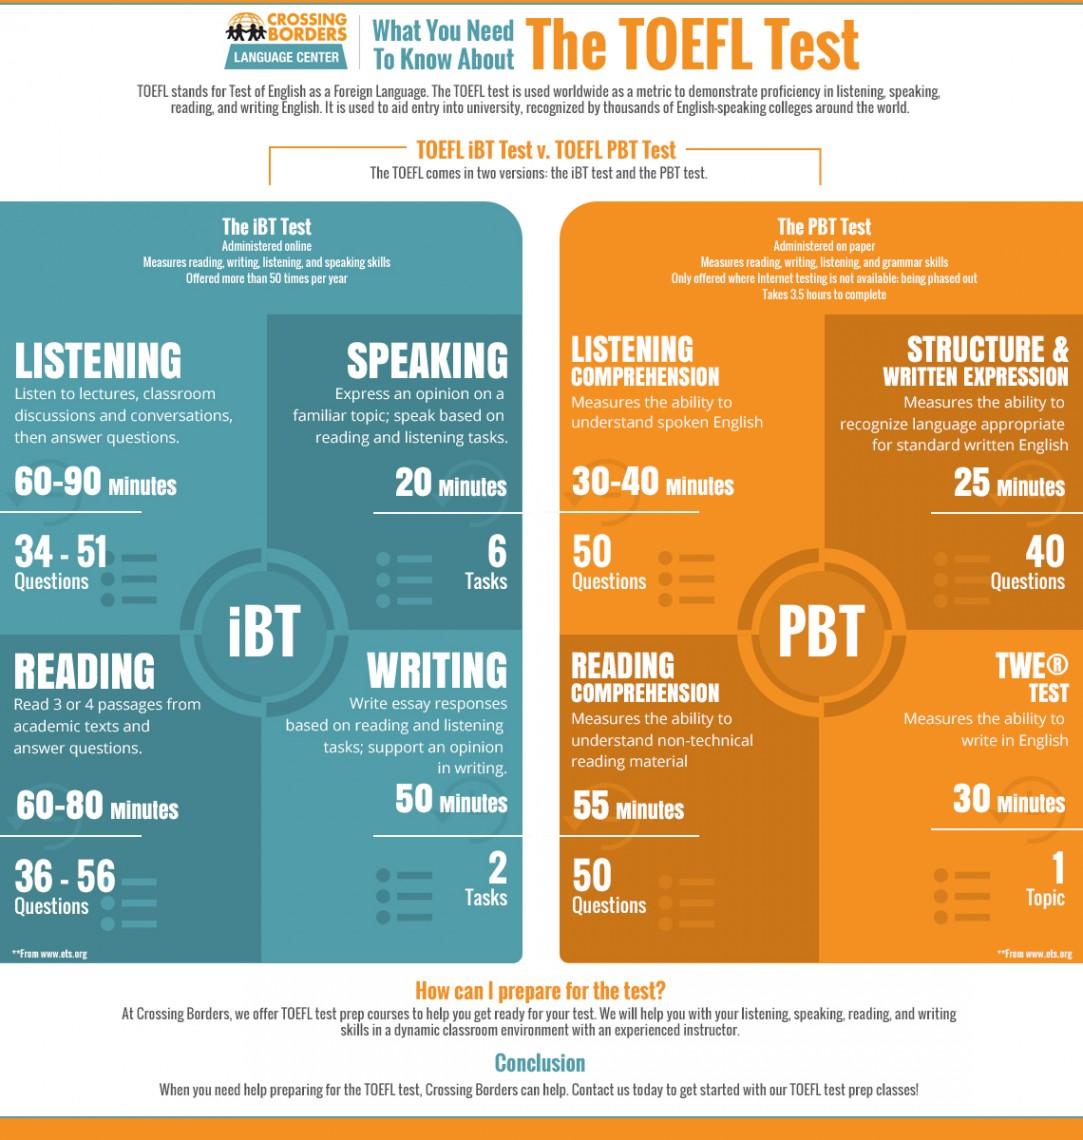 TOEFL Test info